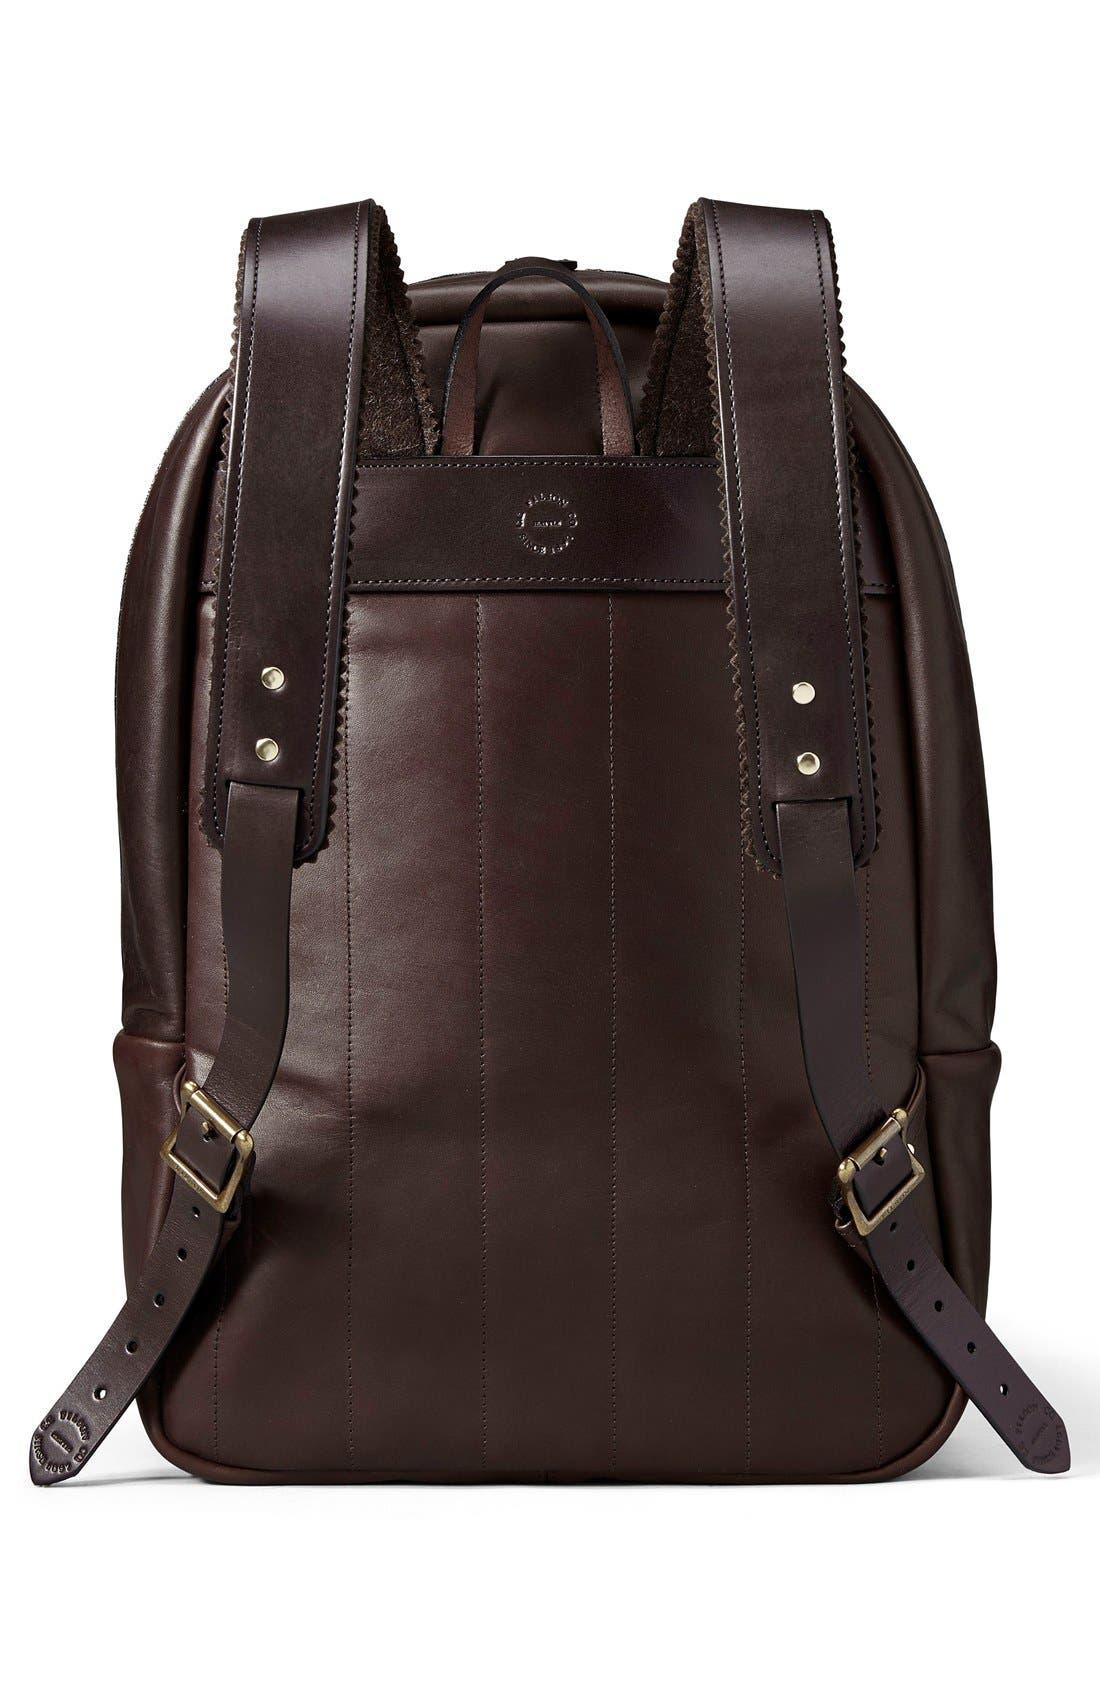 FILSON,                             Weatherproof Leather Backpack,                             Alternate thumbnail 2, color,                             206